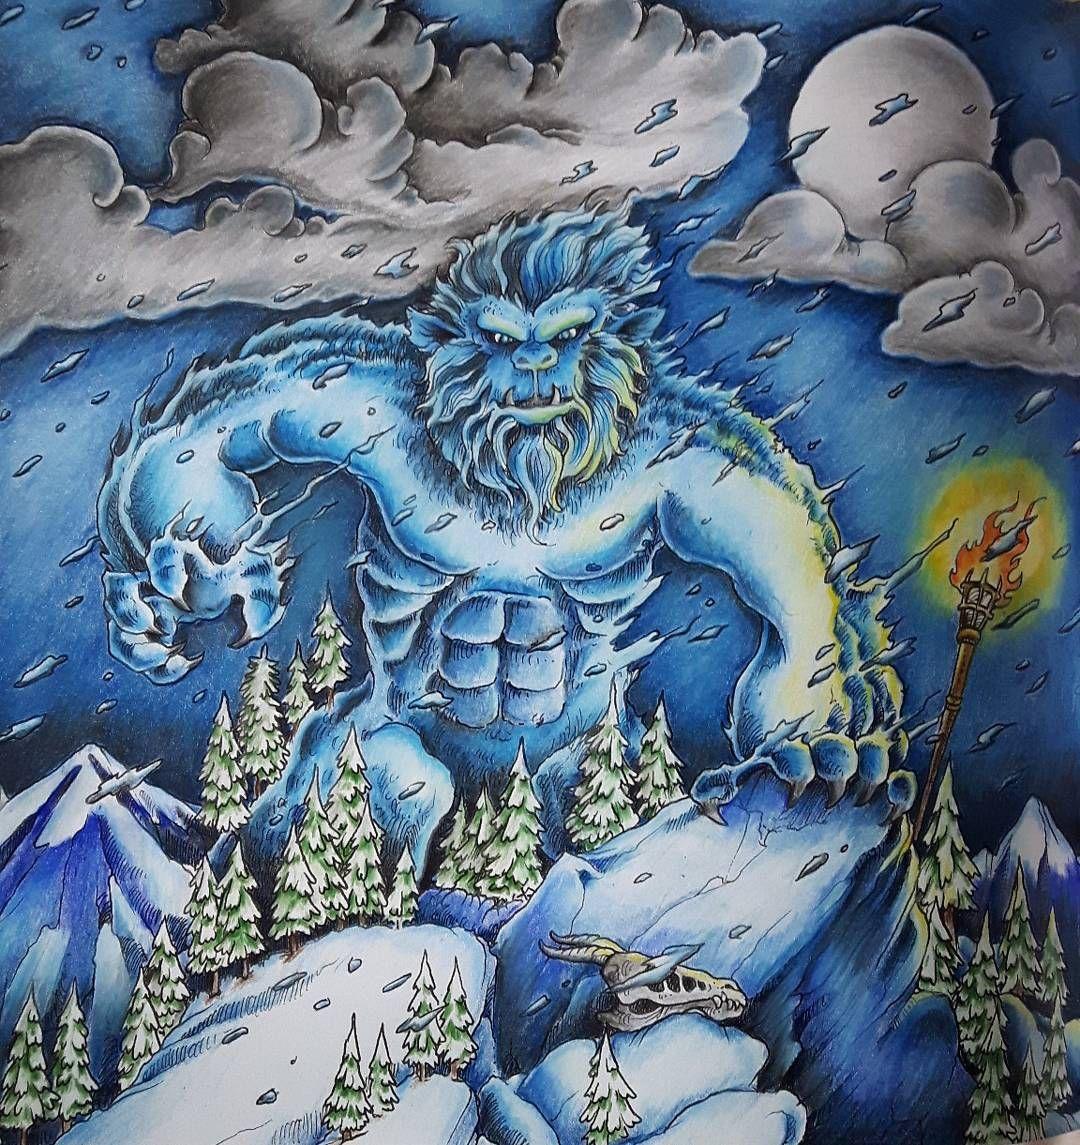 16 Likes 1 Comments Ren Ley Kayess85 On Instagram The Ice Man Rises Mythomorphia Kerbyrosanes Colouri Colorful Art Animorphia Coloring American Art